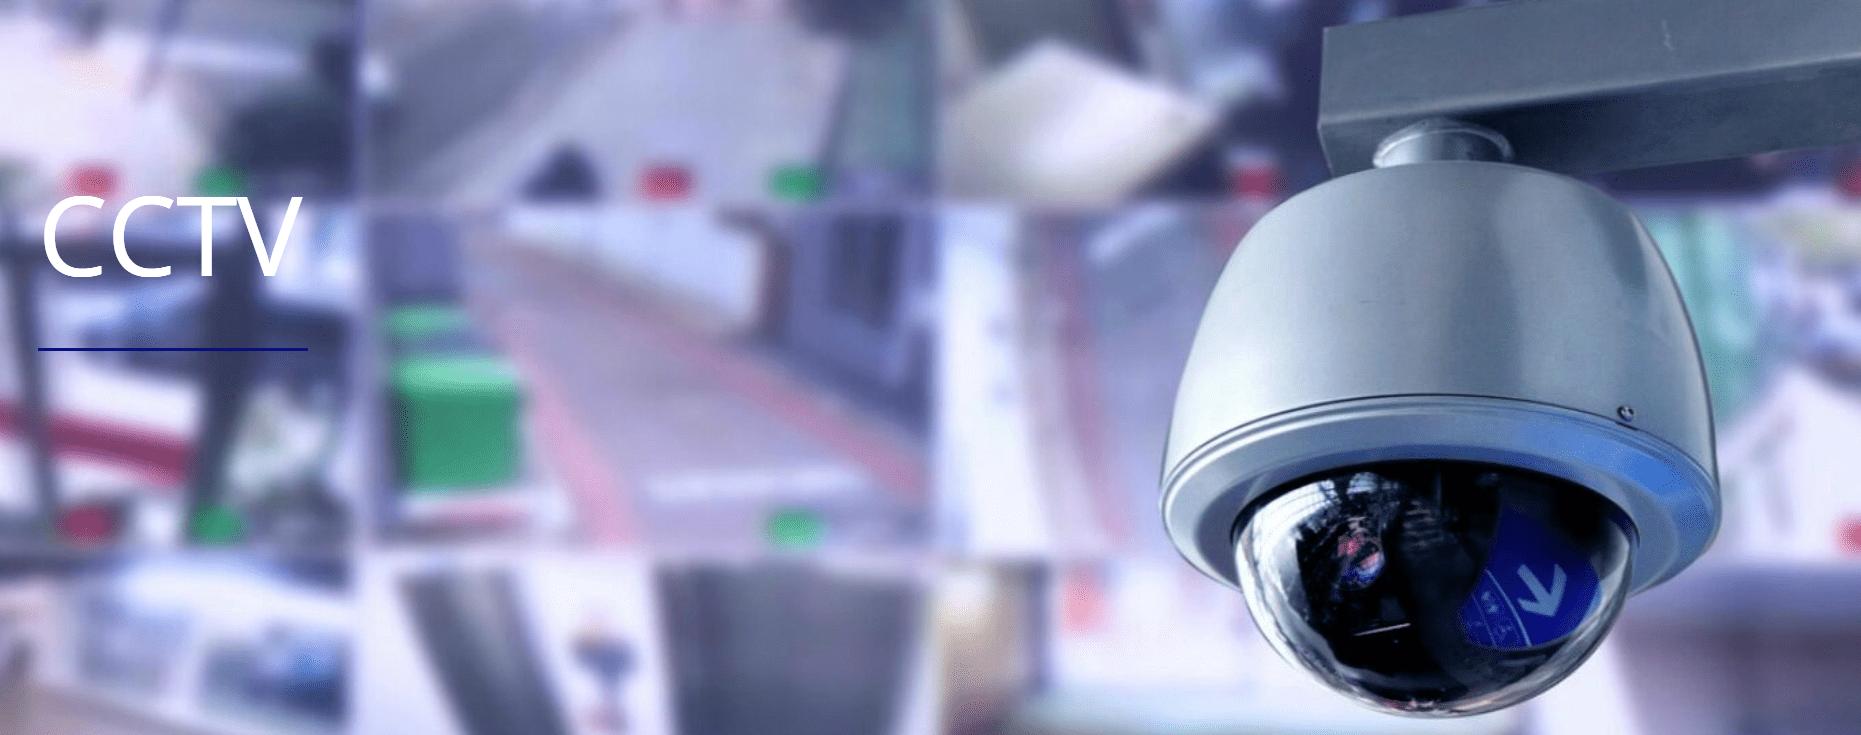 CCTV - Mobil